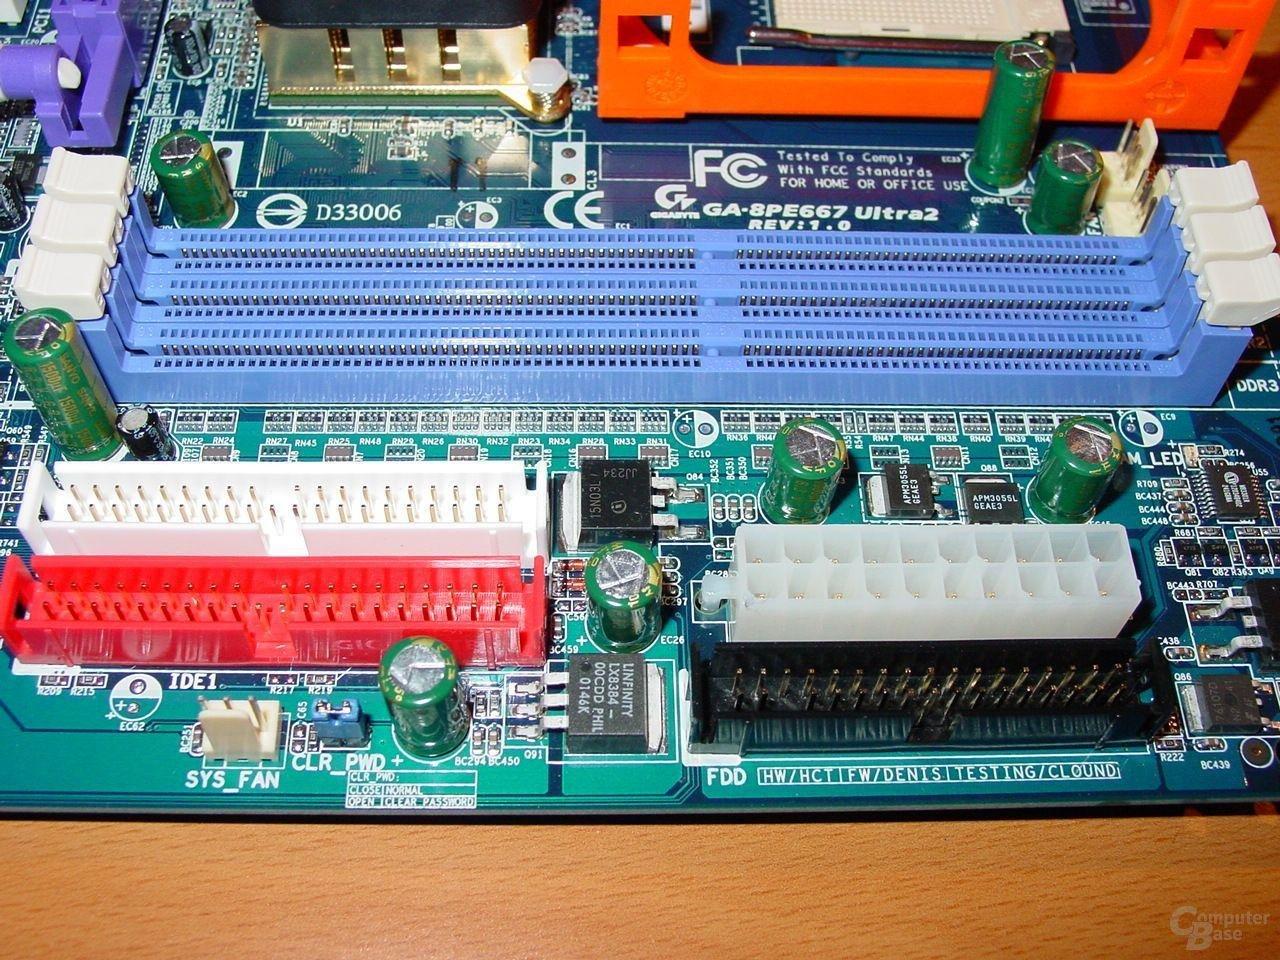 GA-8PE667 Ultra 2 - RAM, IDE, Power